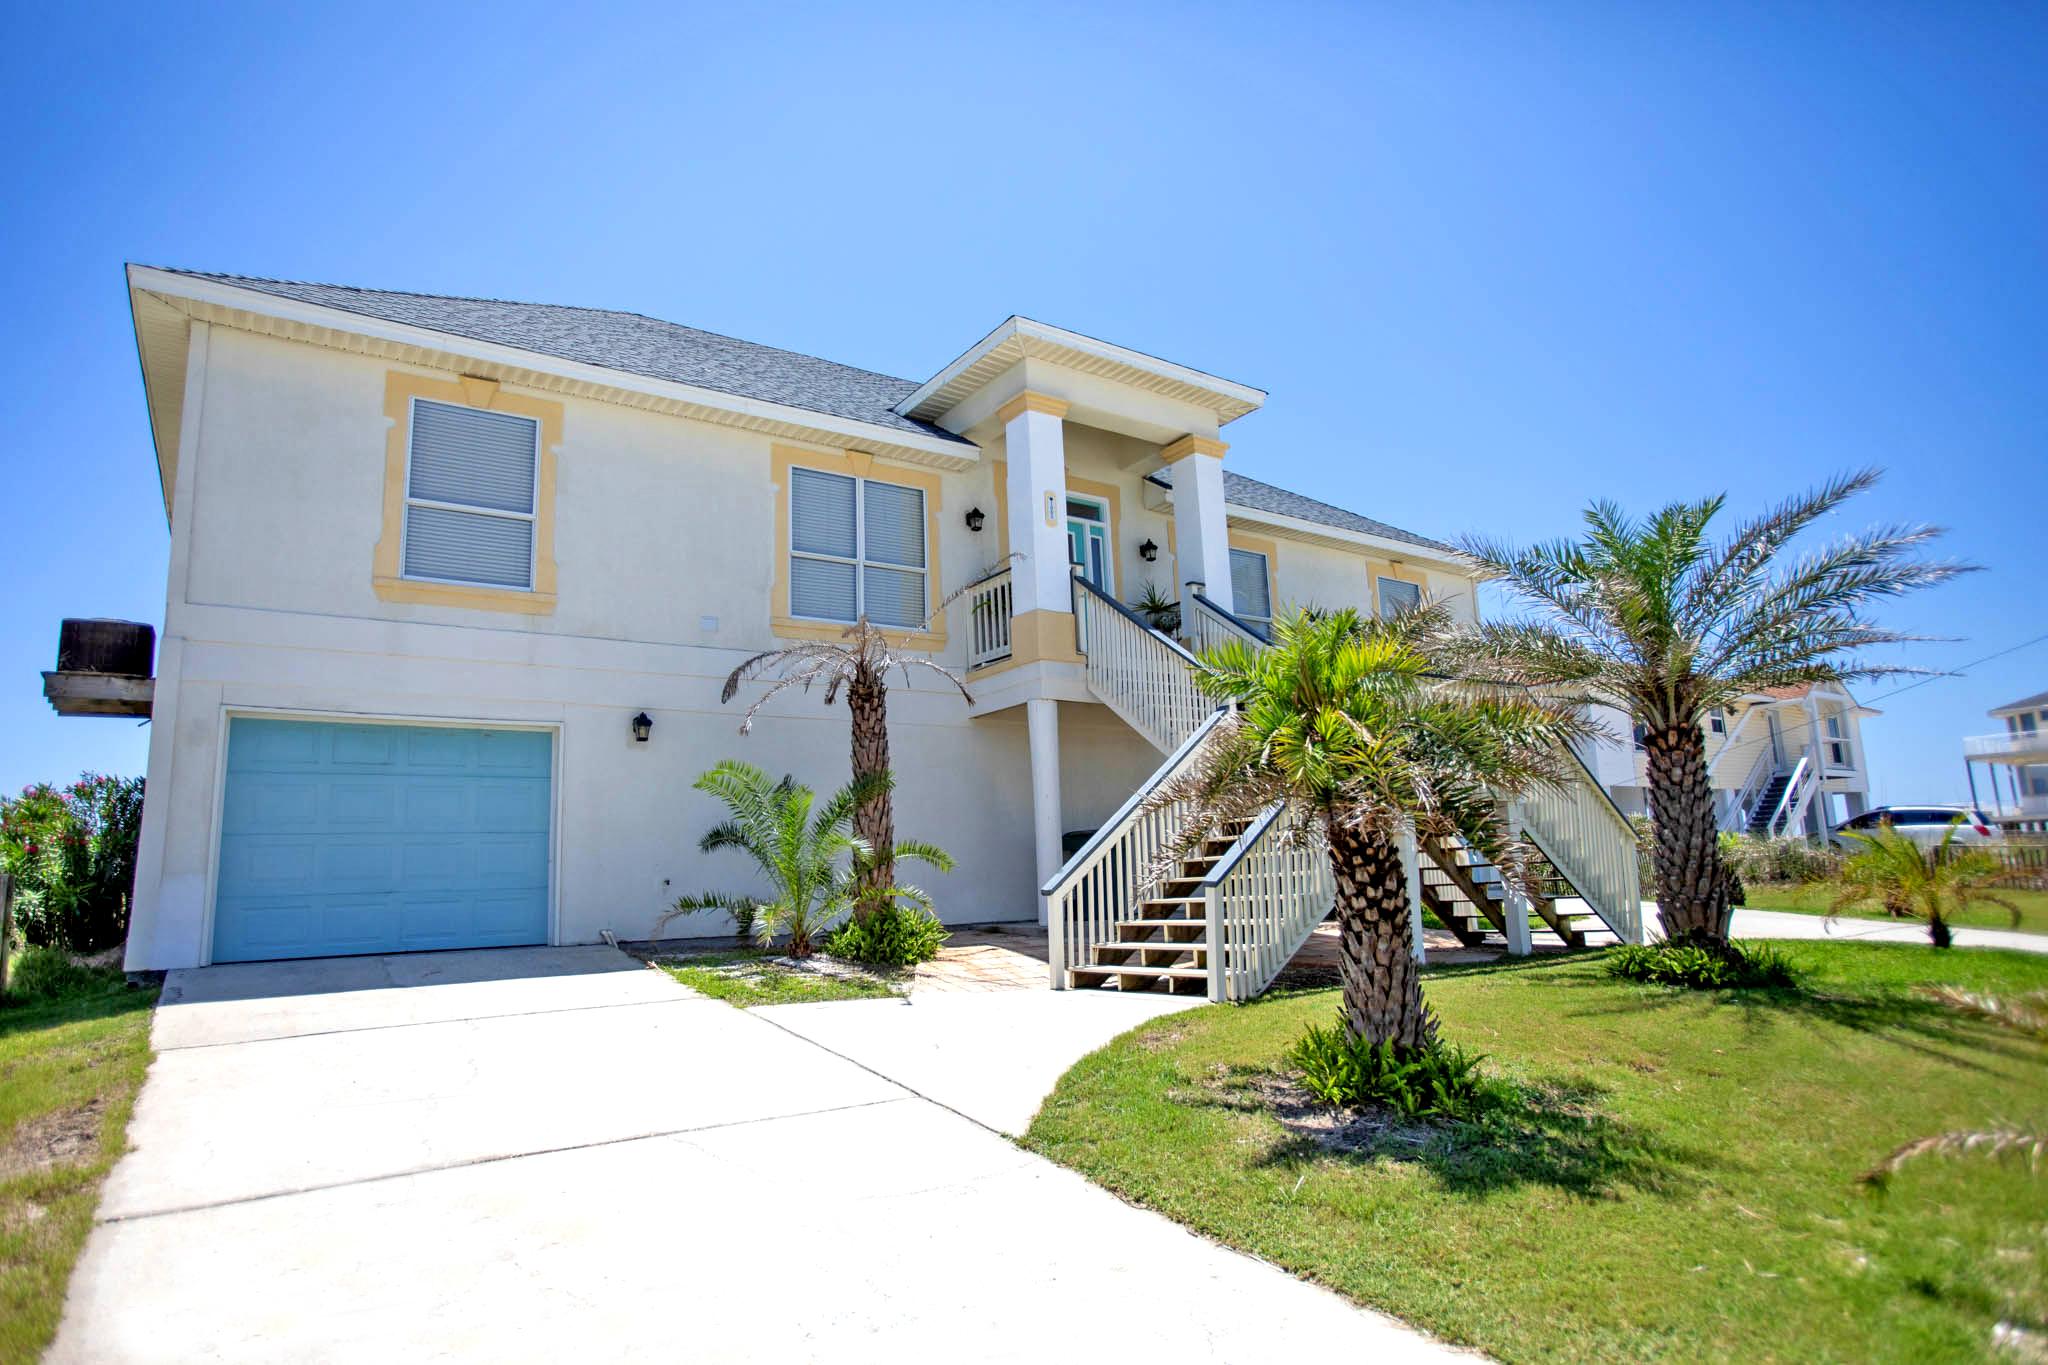 Ariola 1002 House/Cottage rental in Pensacola Beach House Rentals in Pensacola Beach Florida - #2